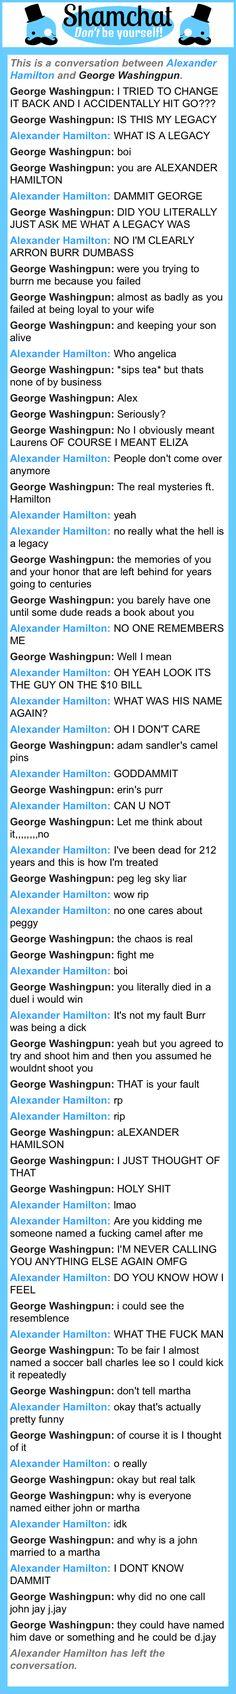 A conversation between George Washingpun and Alexander Hamilton